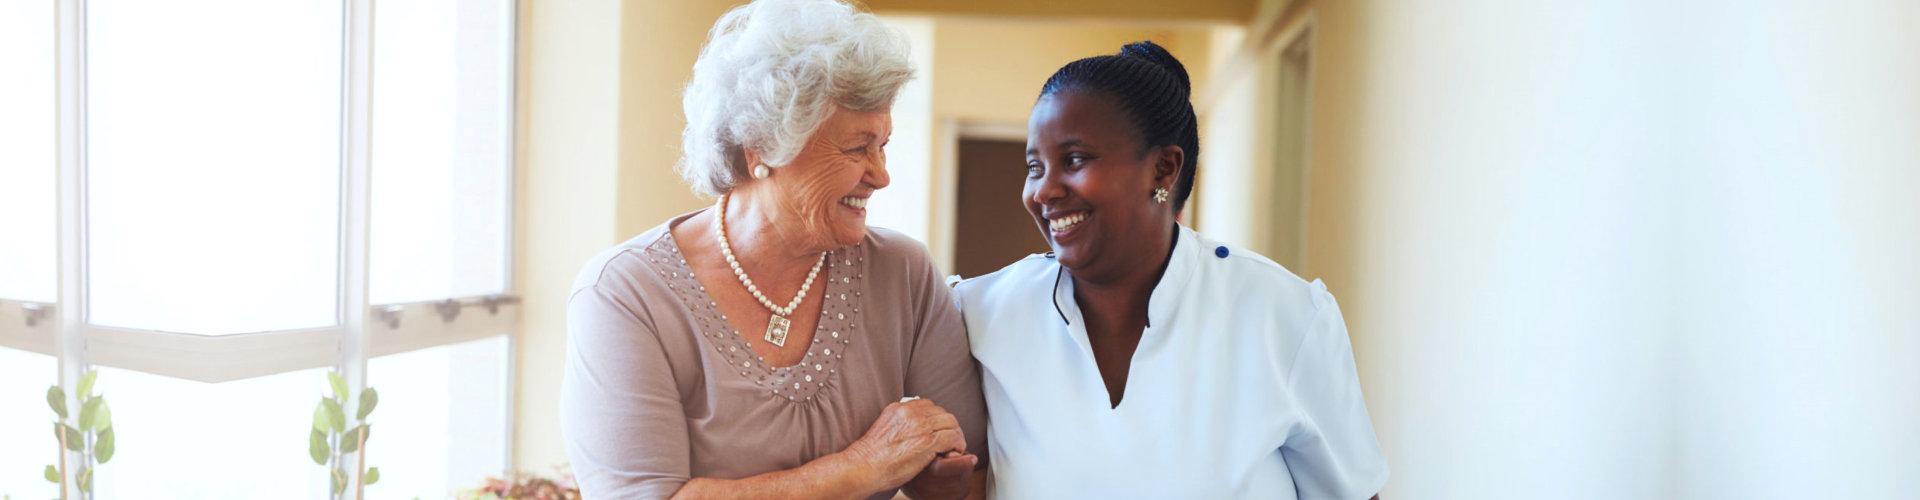 caregiver assisting senior woman walking and smiling